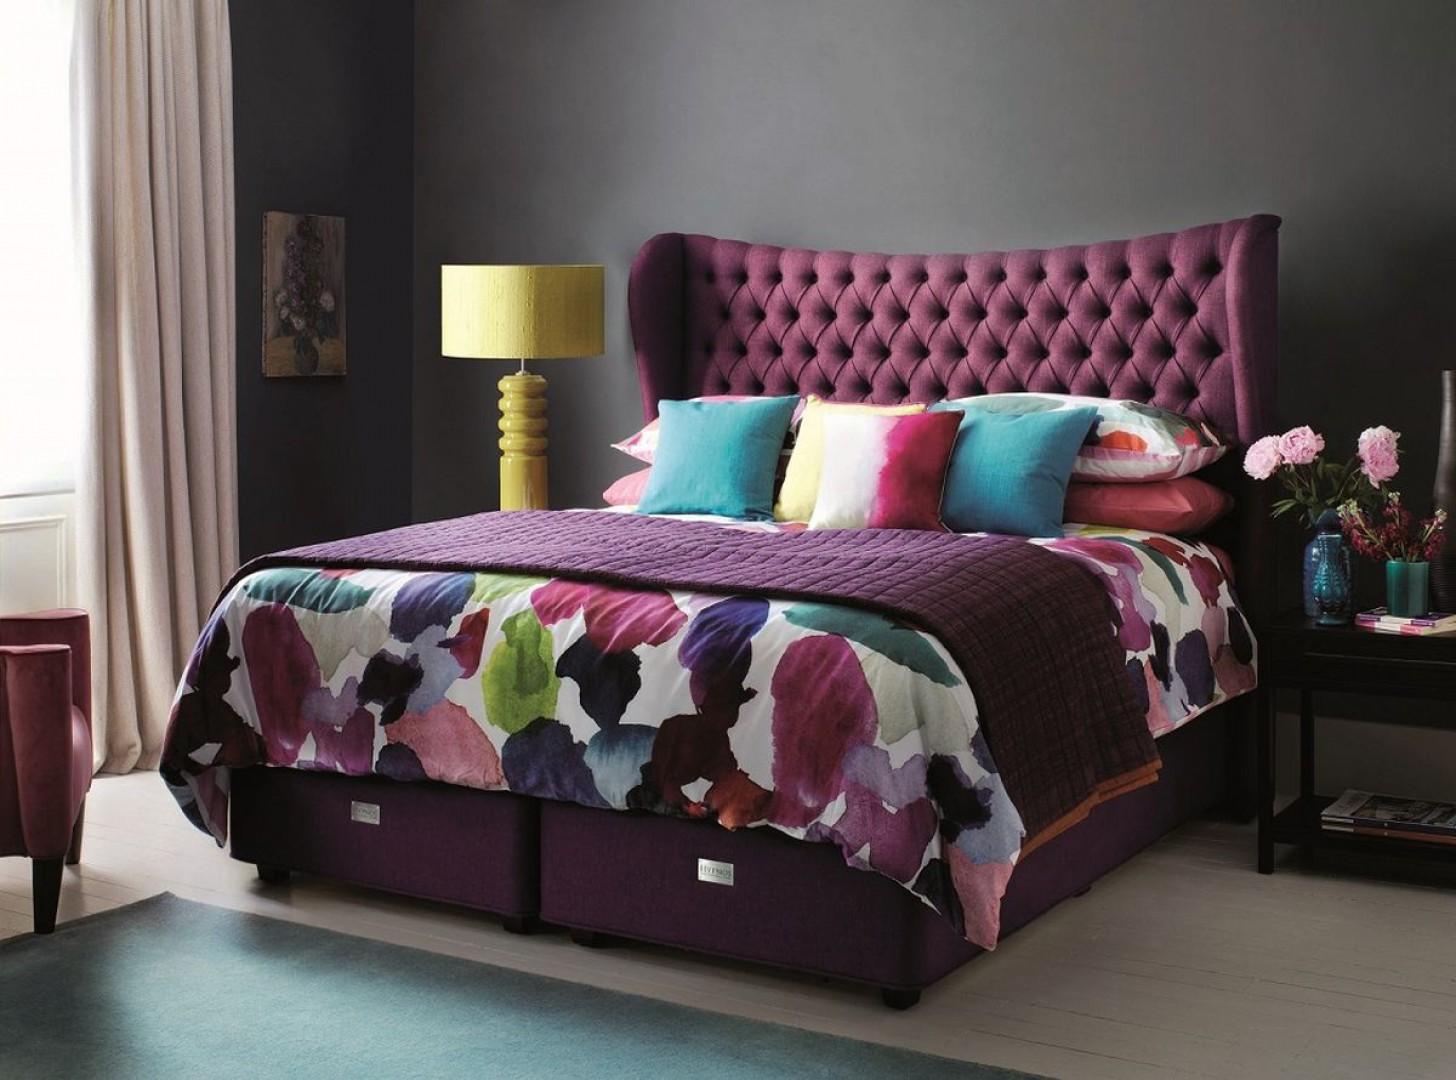 Fot. Hypnos Beds